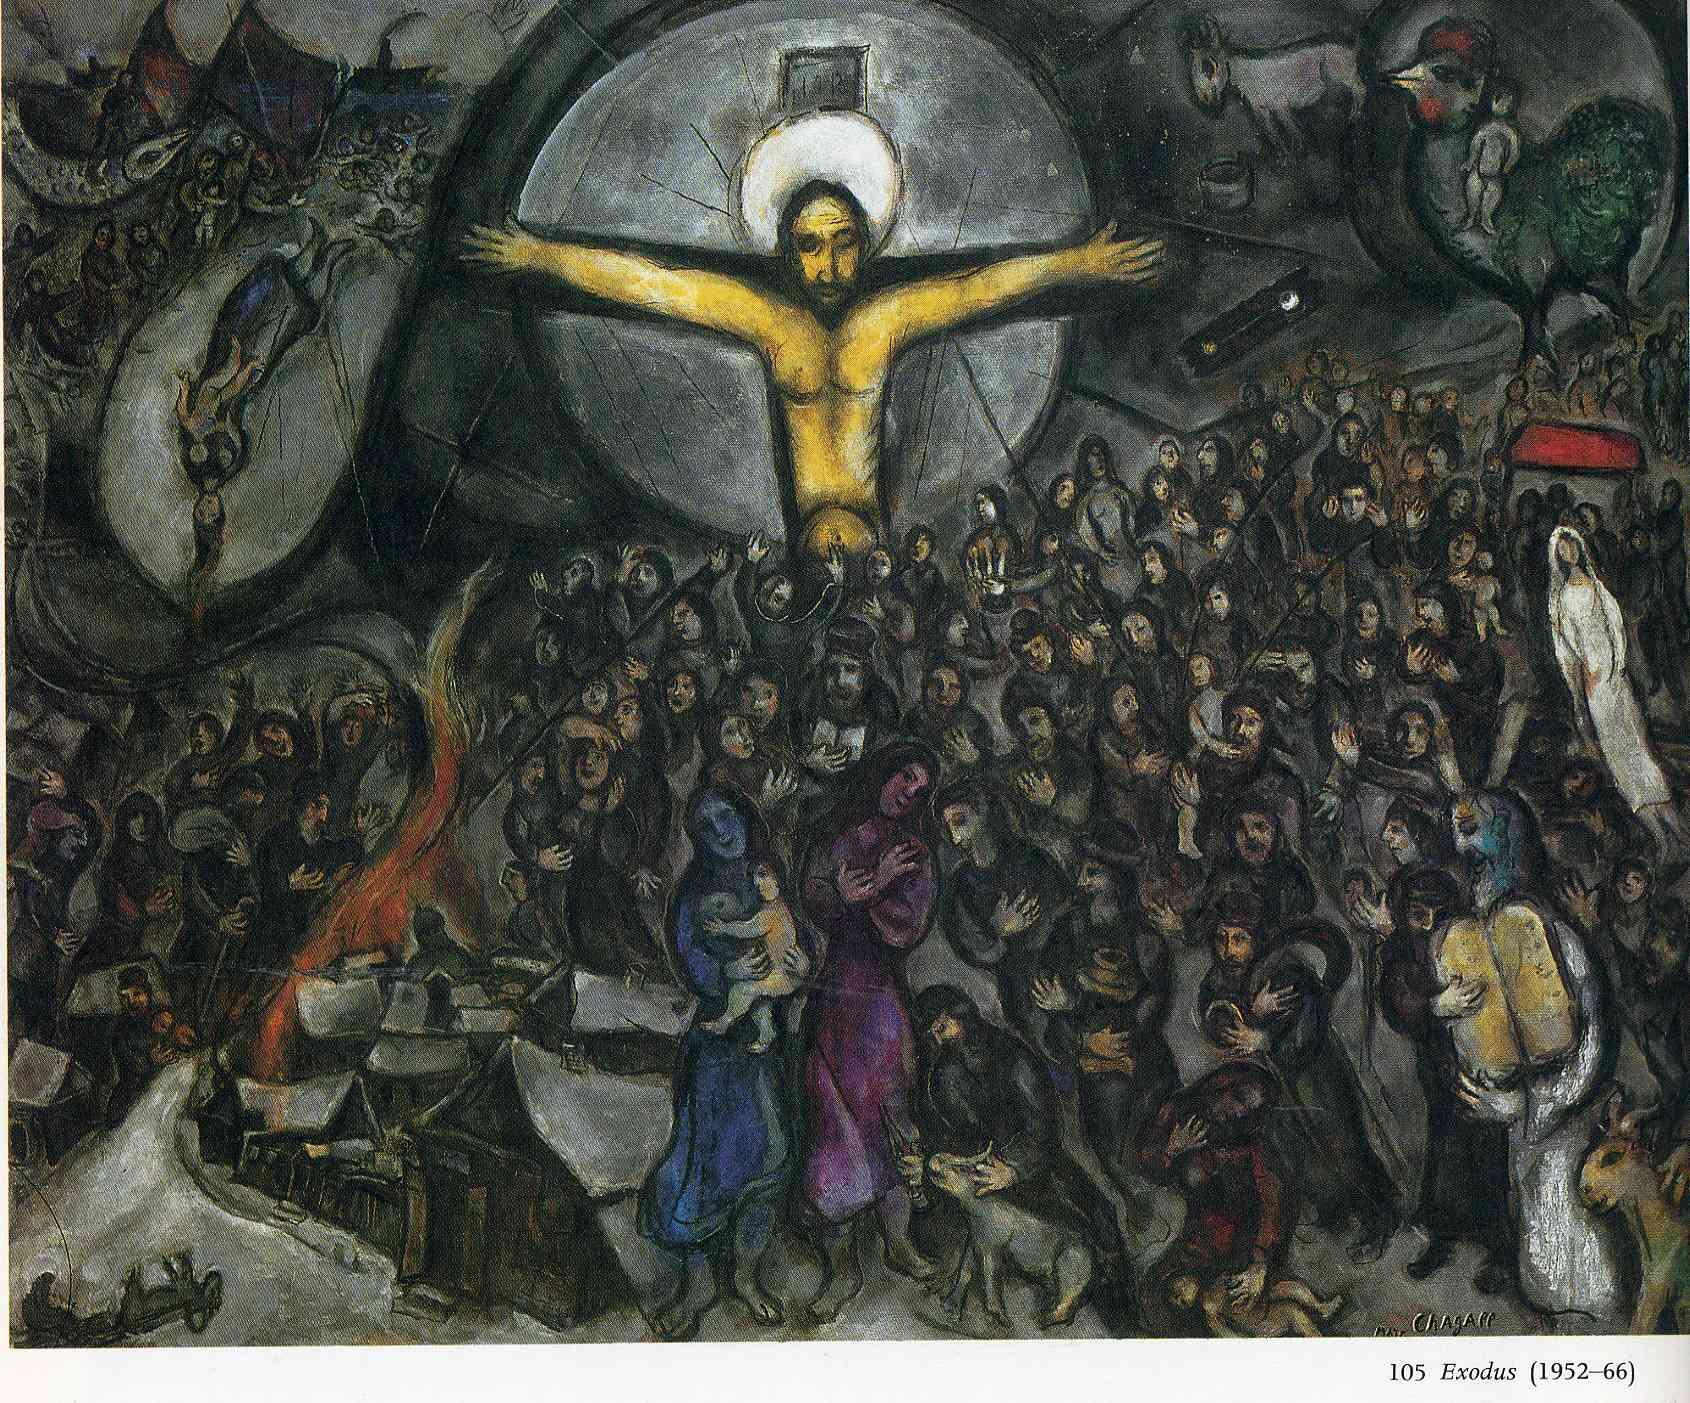 1952-66, Exodus de Marc Chagall